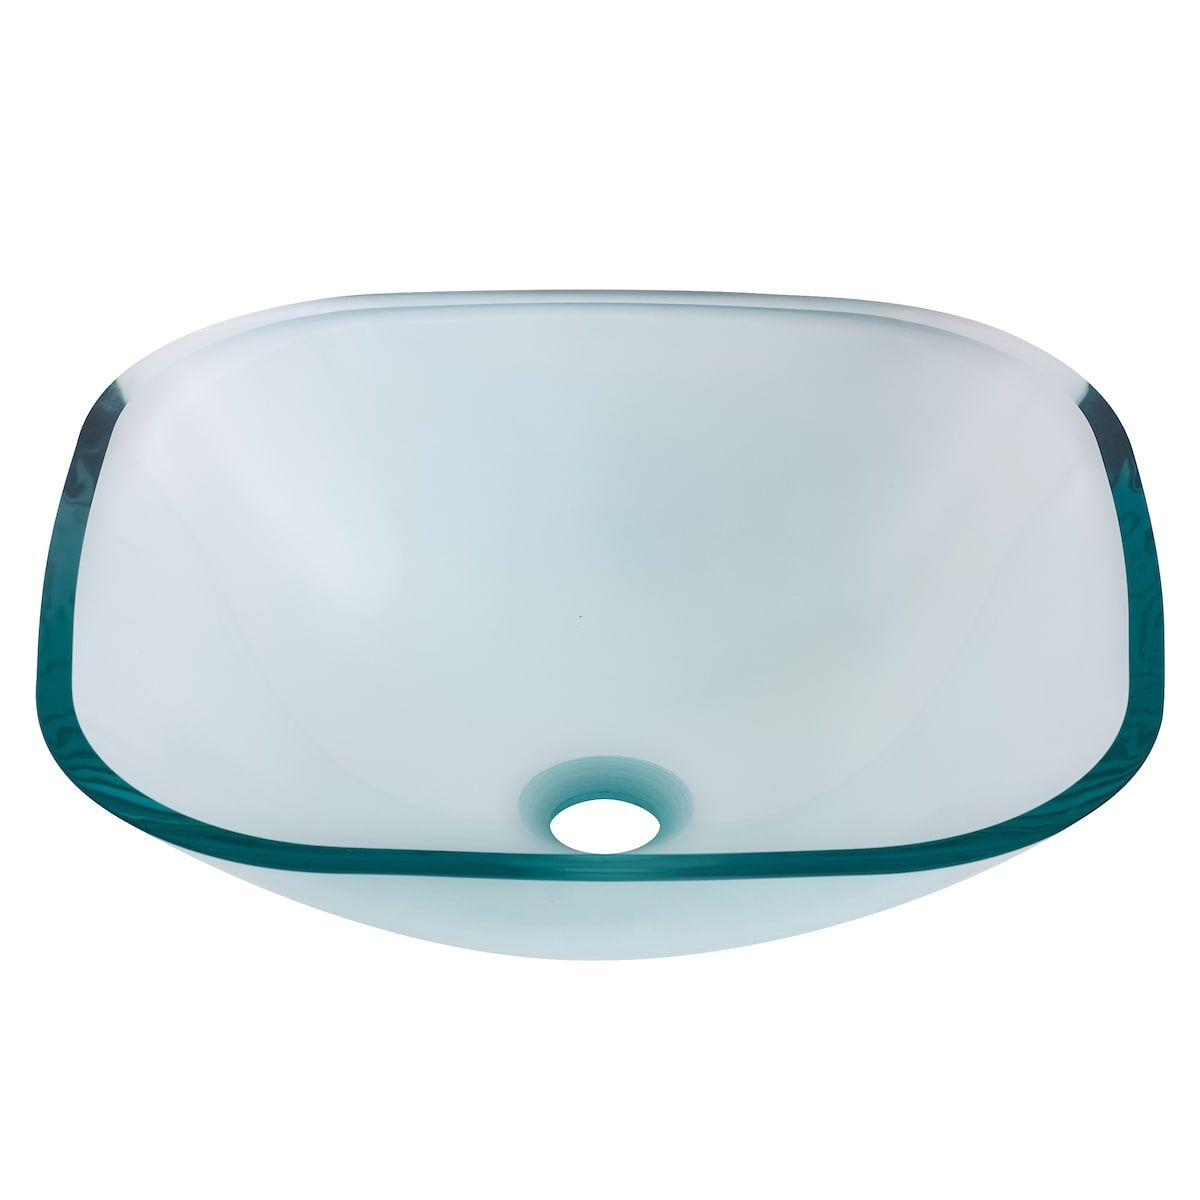 Miseno Mno 7108 Sink Glass Vessel Sinks Glass Vessel